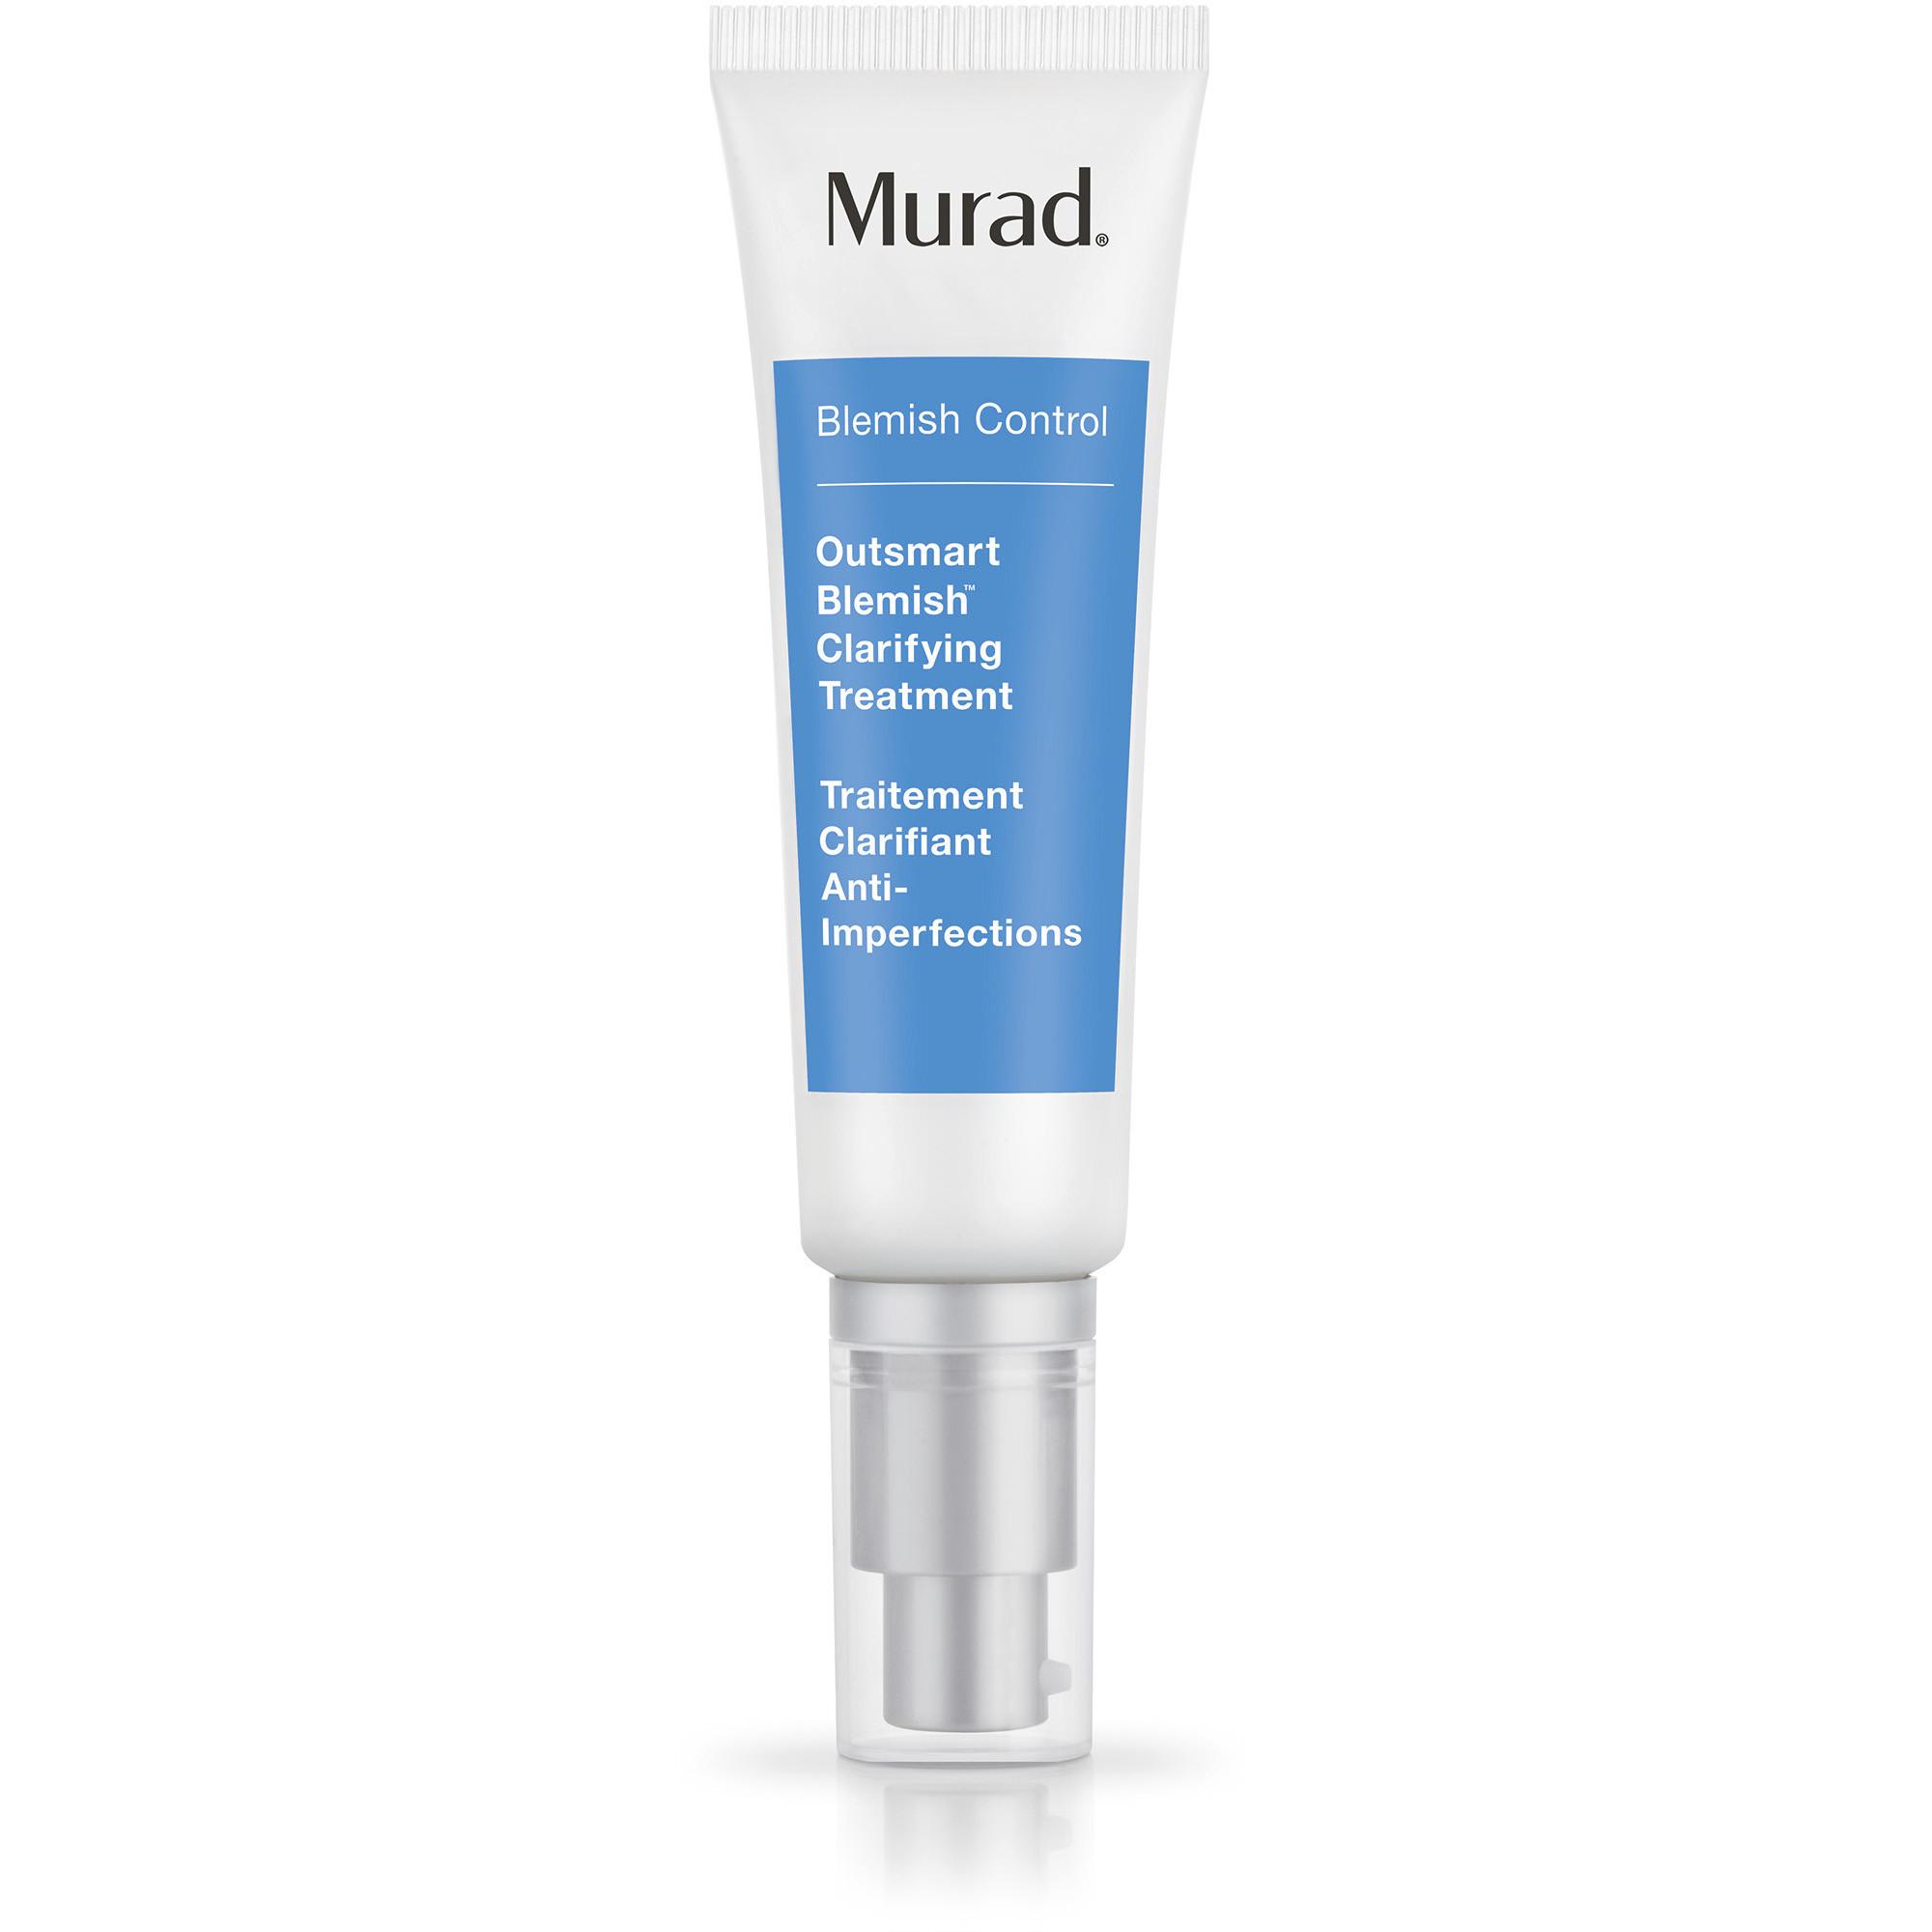 Murad Outsmart Blemish Clarifying Treatment, 50 ml